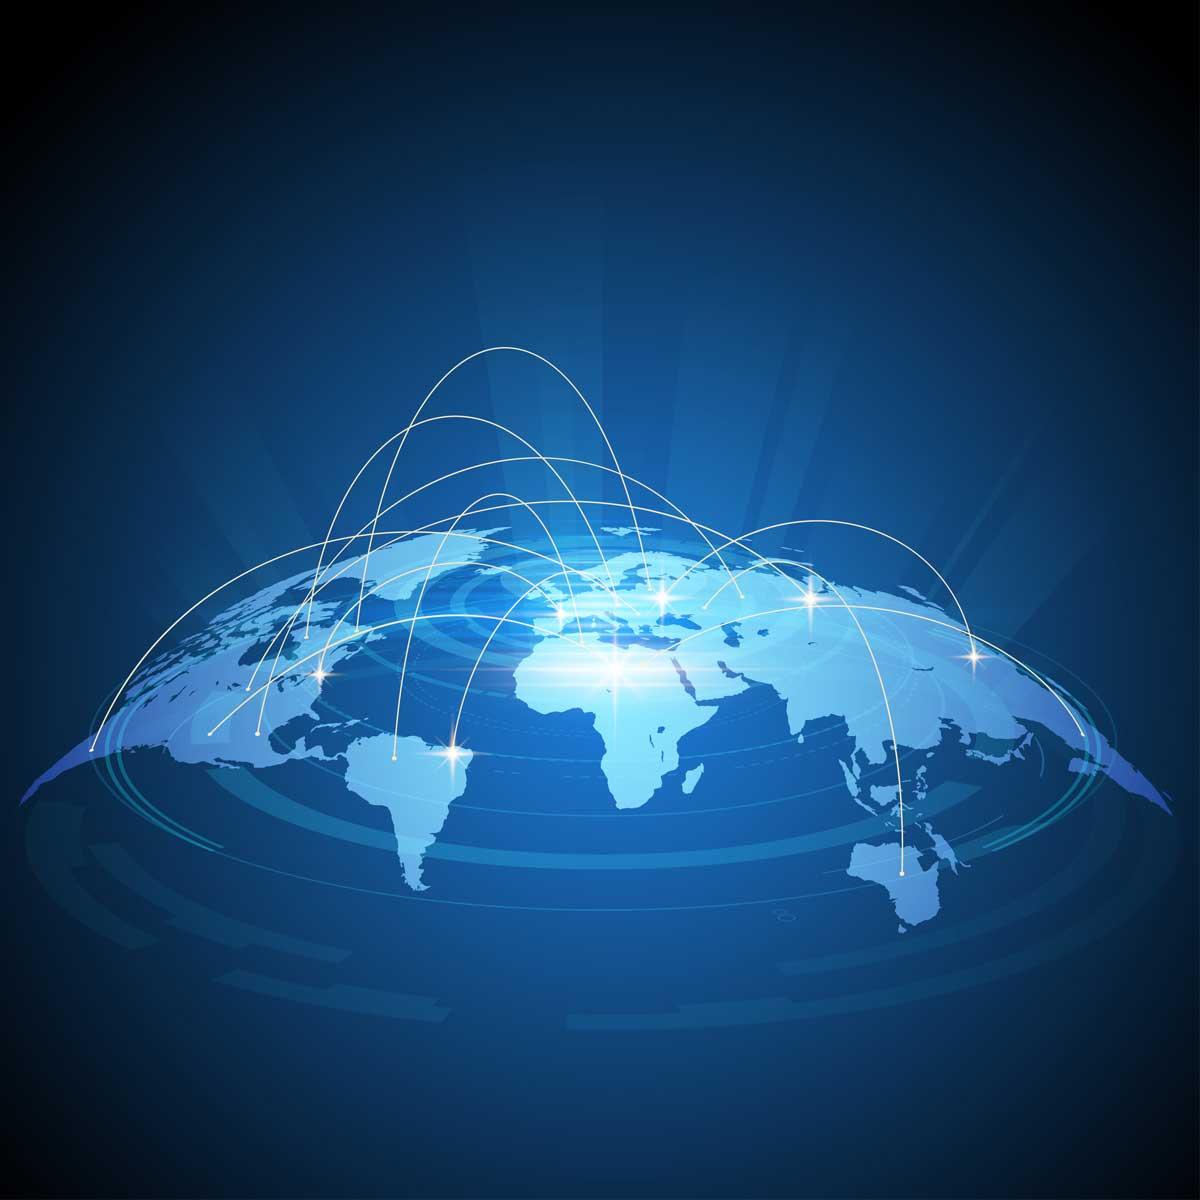 Futuristic world map traffic design